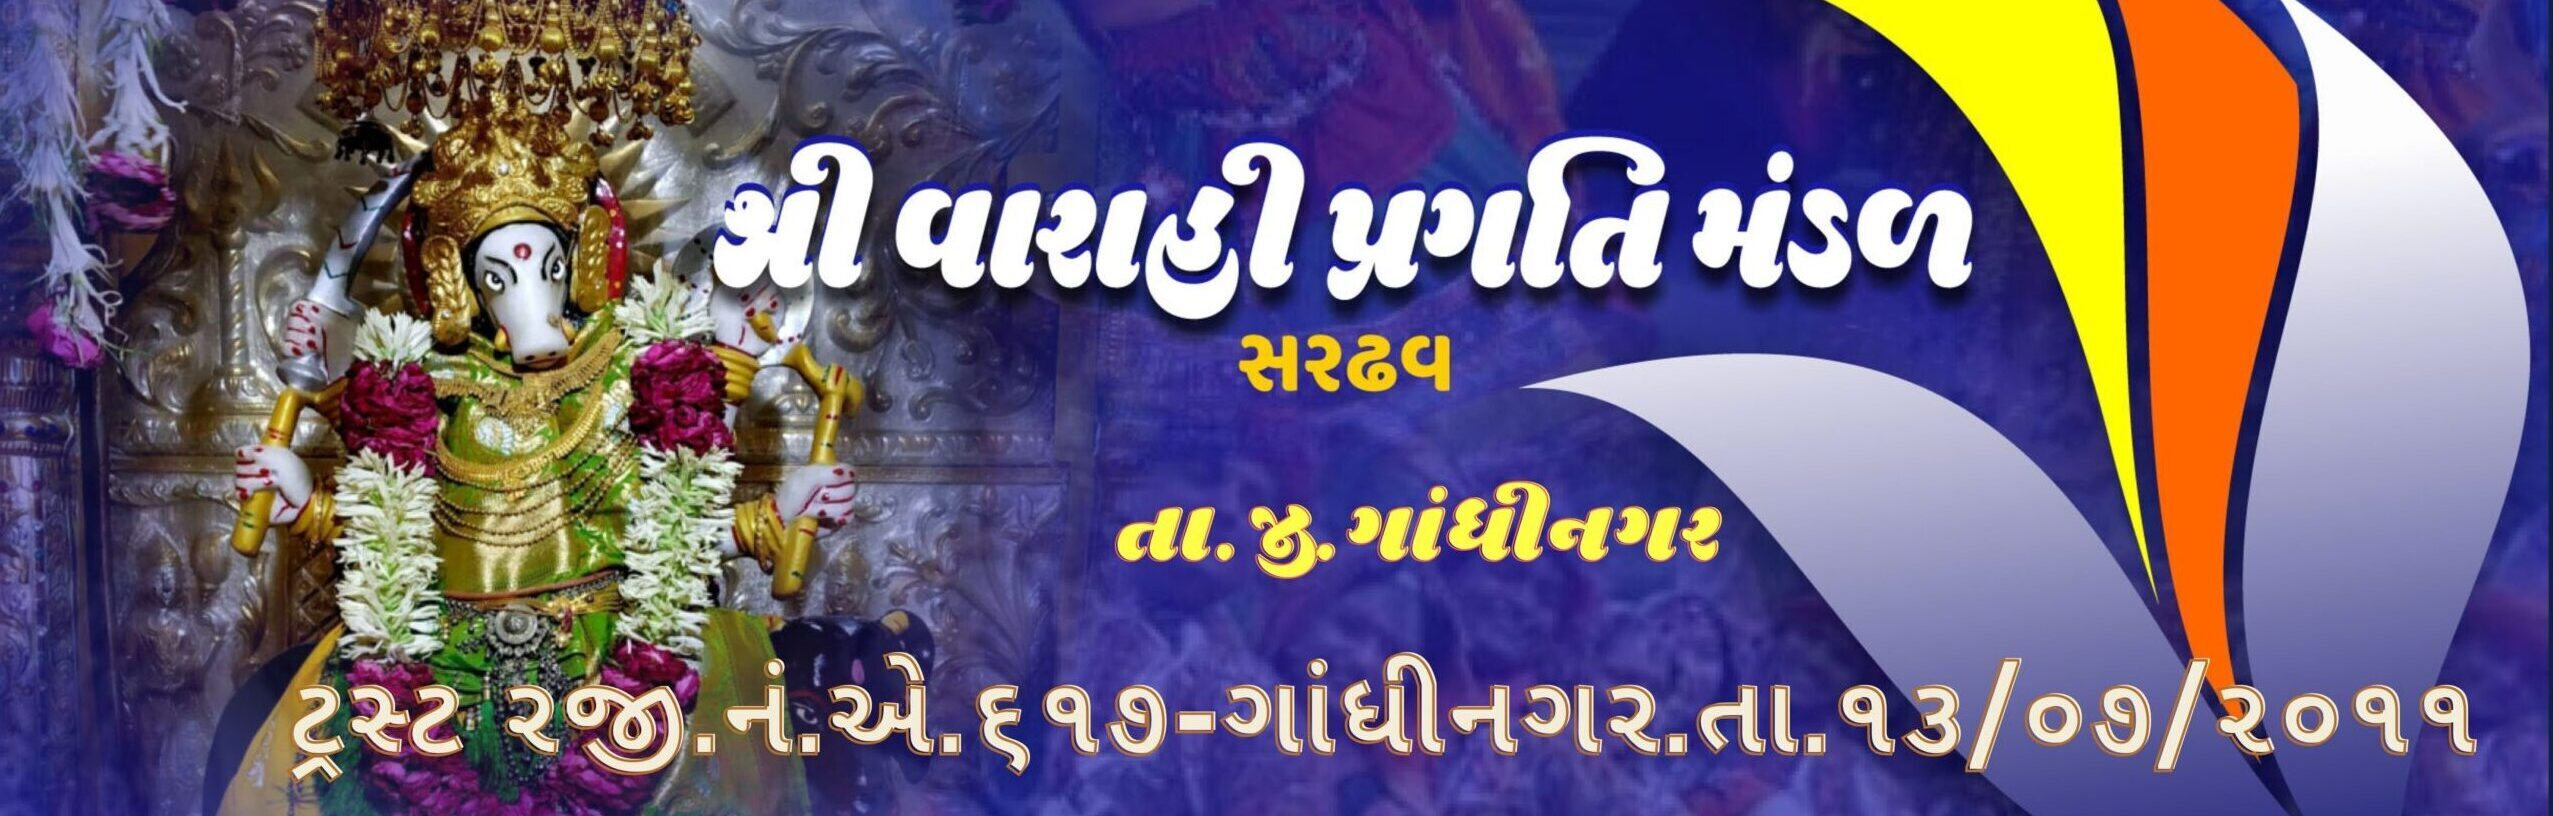 Sardhav